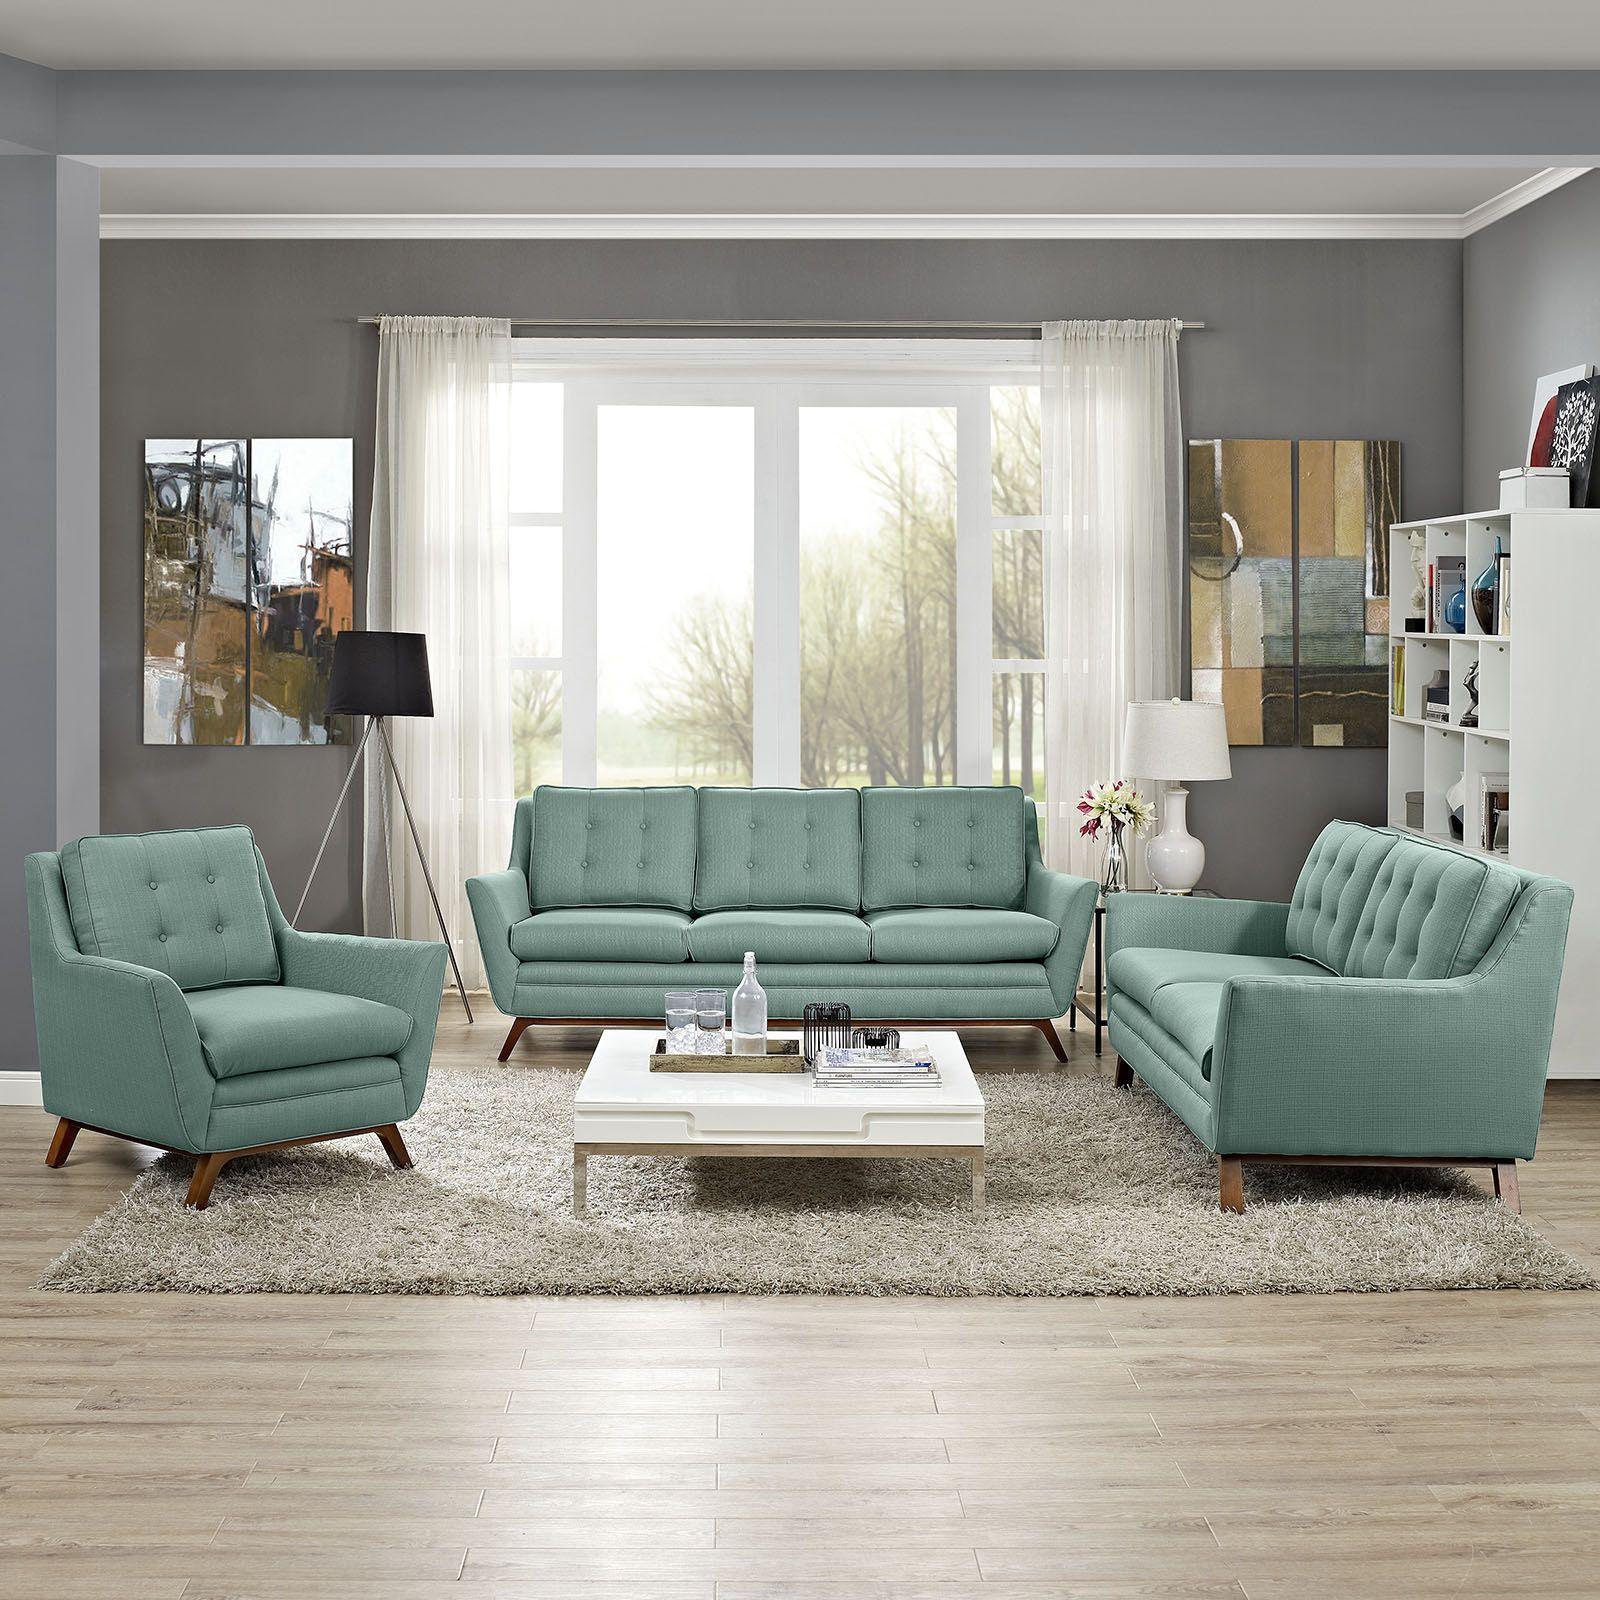 Beguile Living Room Set Fabric Set of